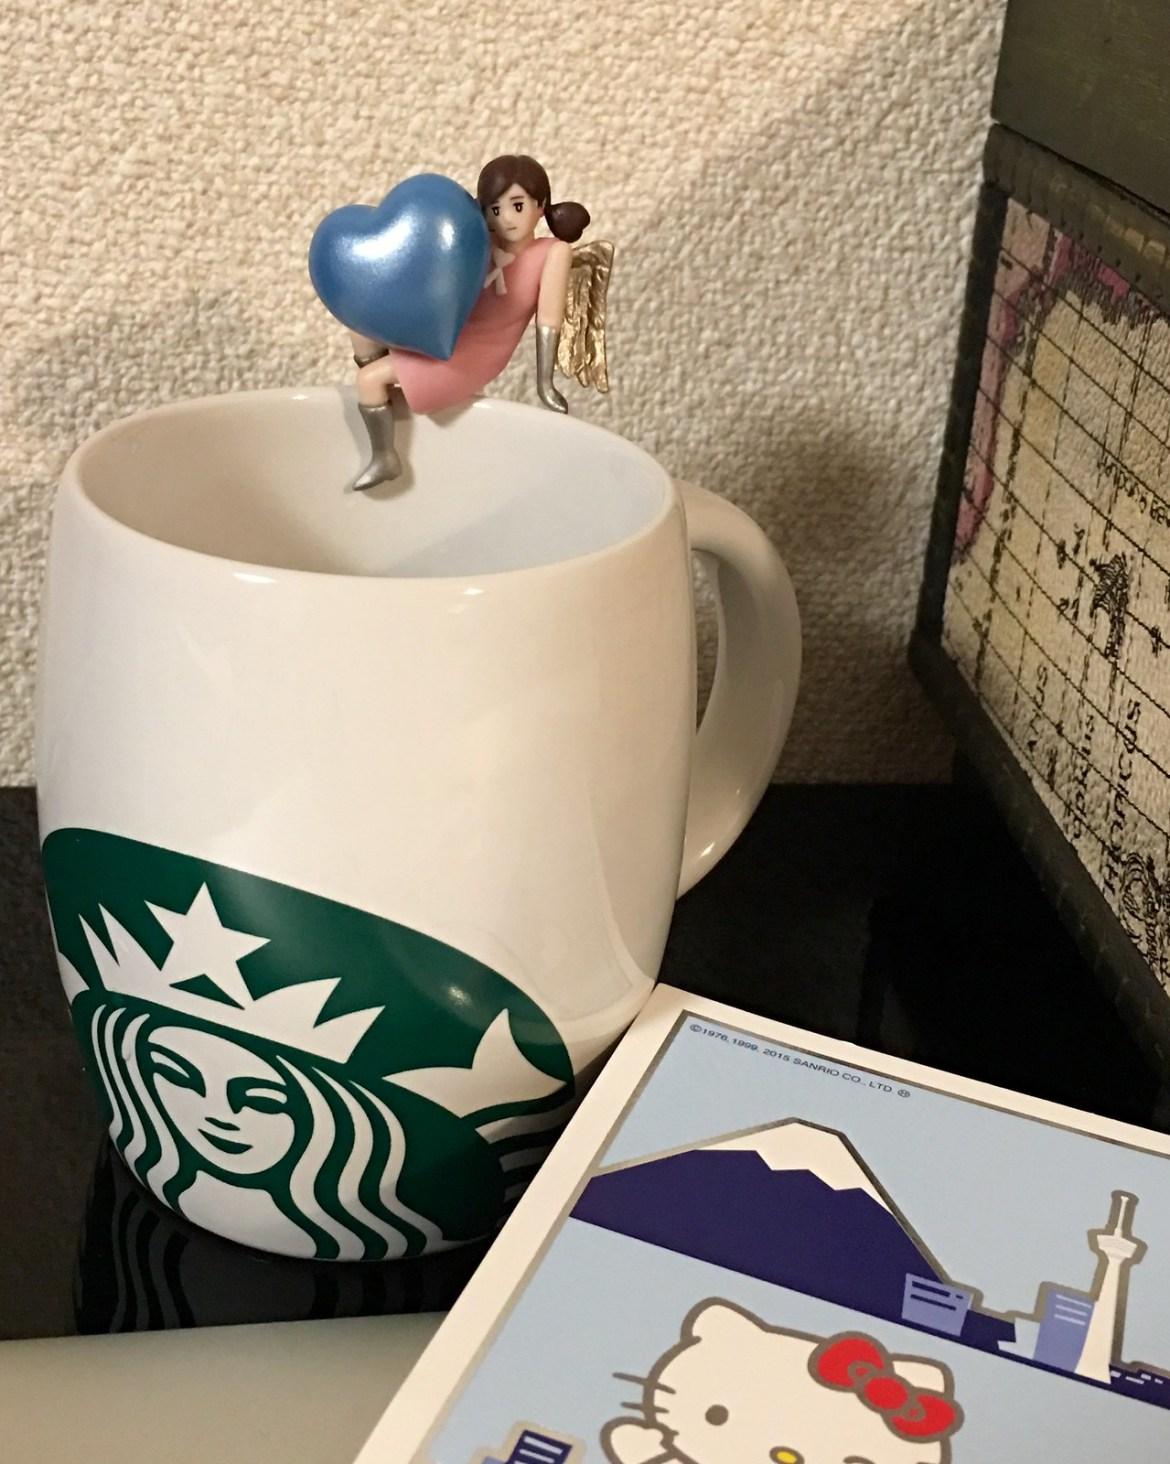 Fuchiko on a cup